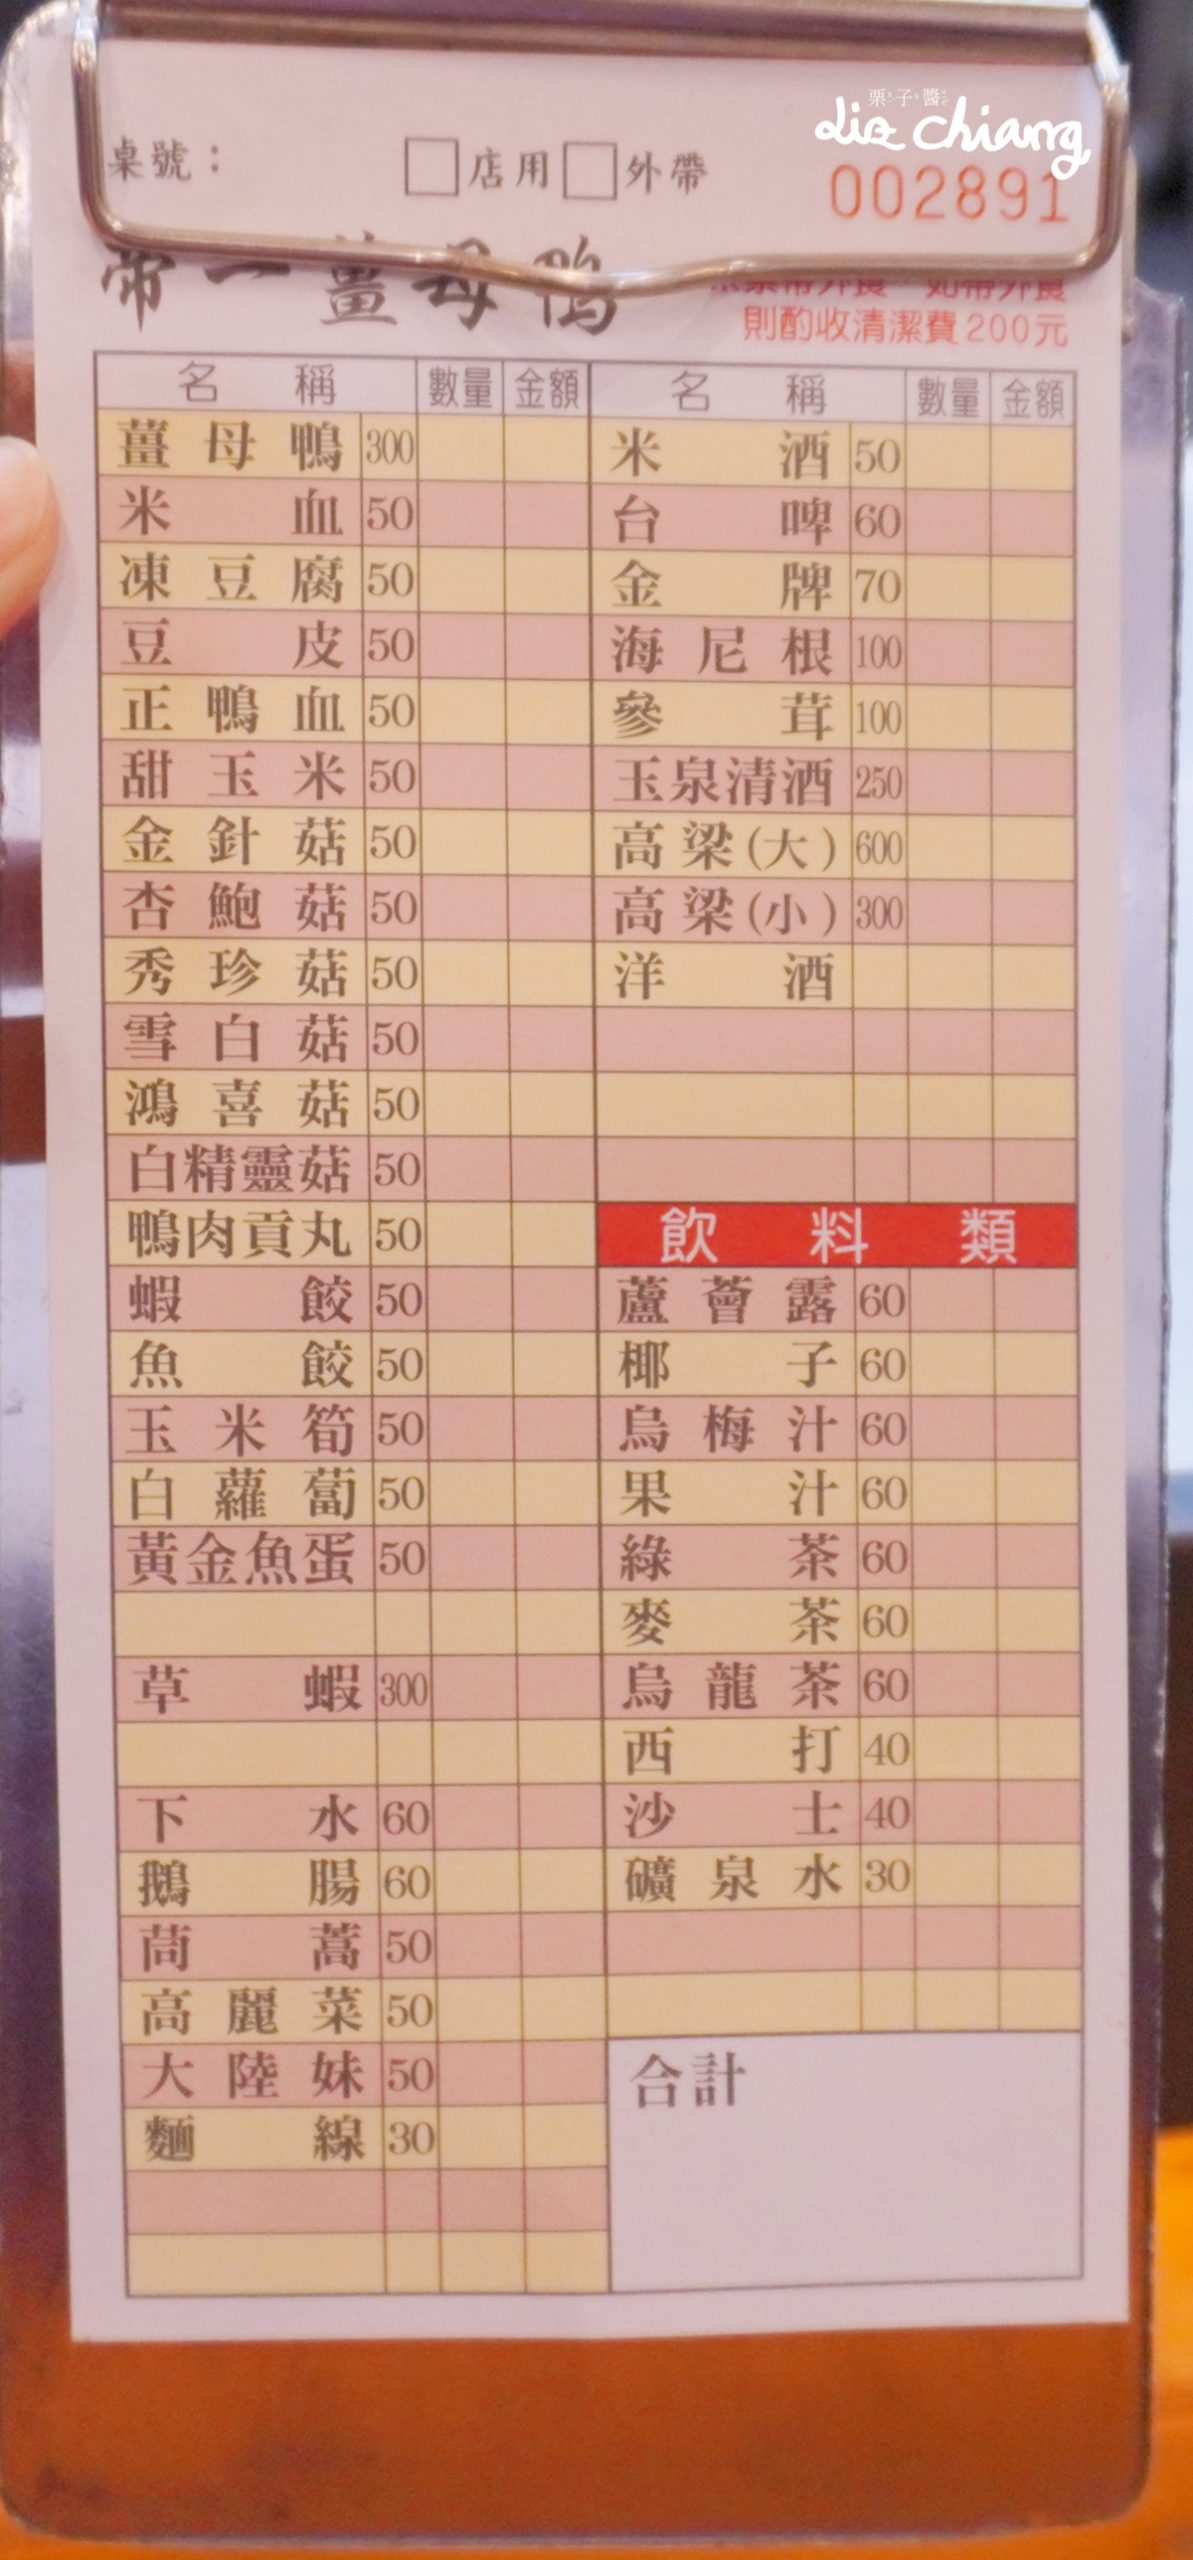 DSC05685Liz chiang 栗子醬-美食部落客-料理部落客